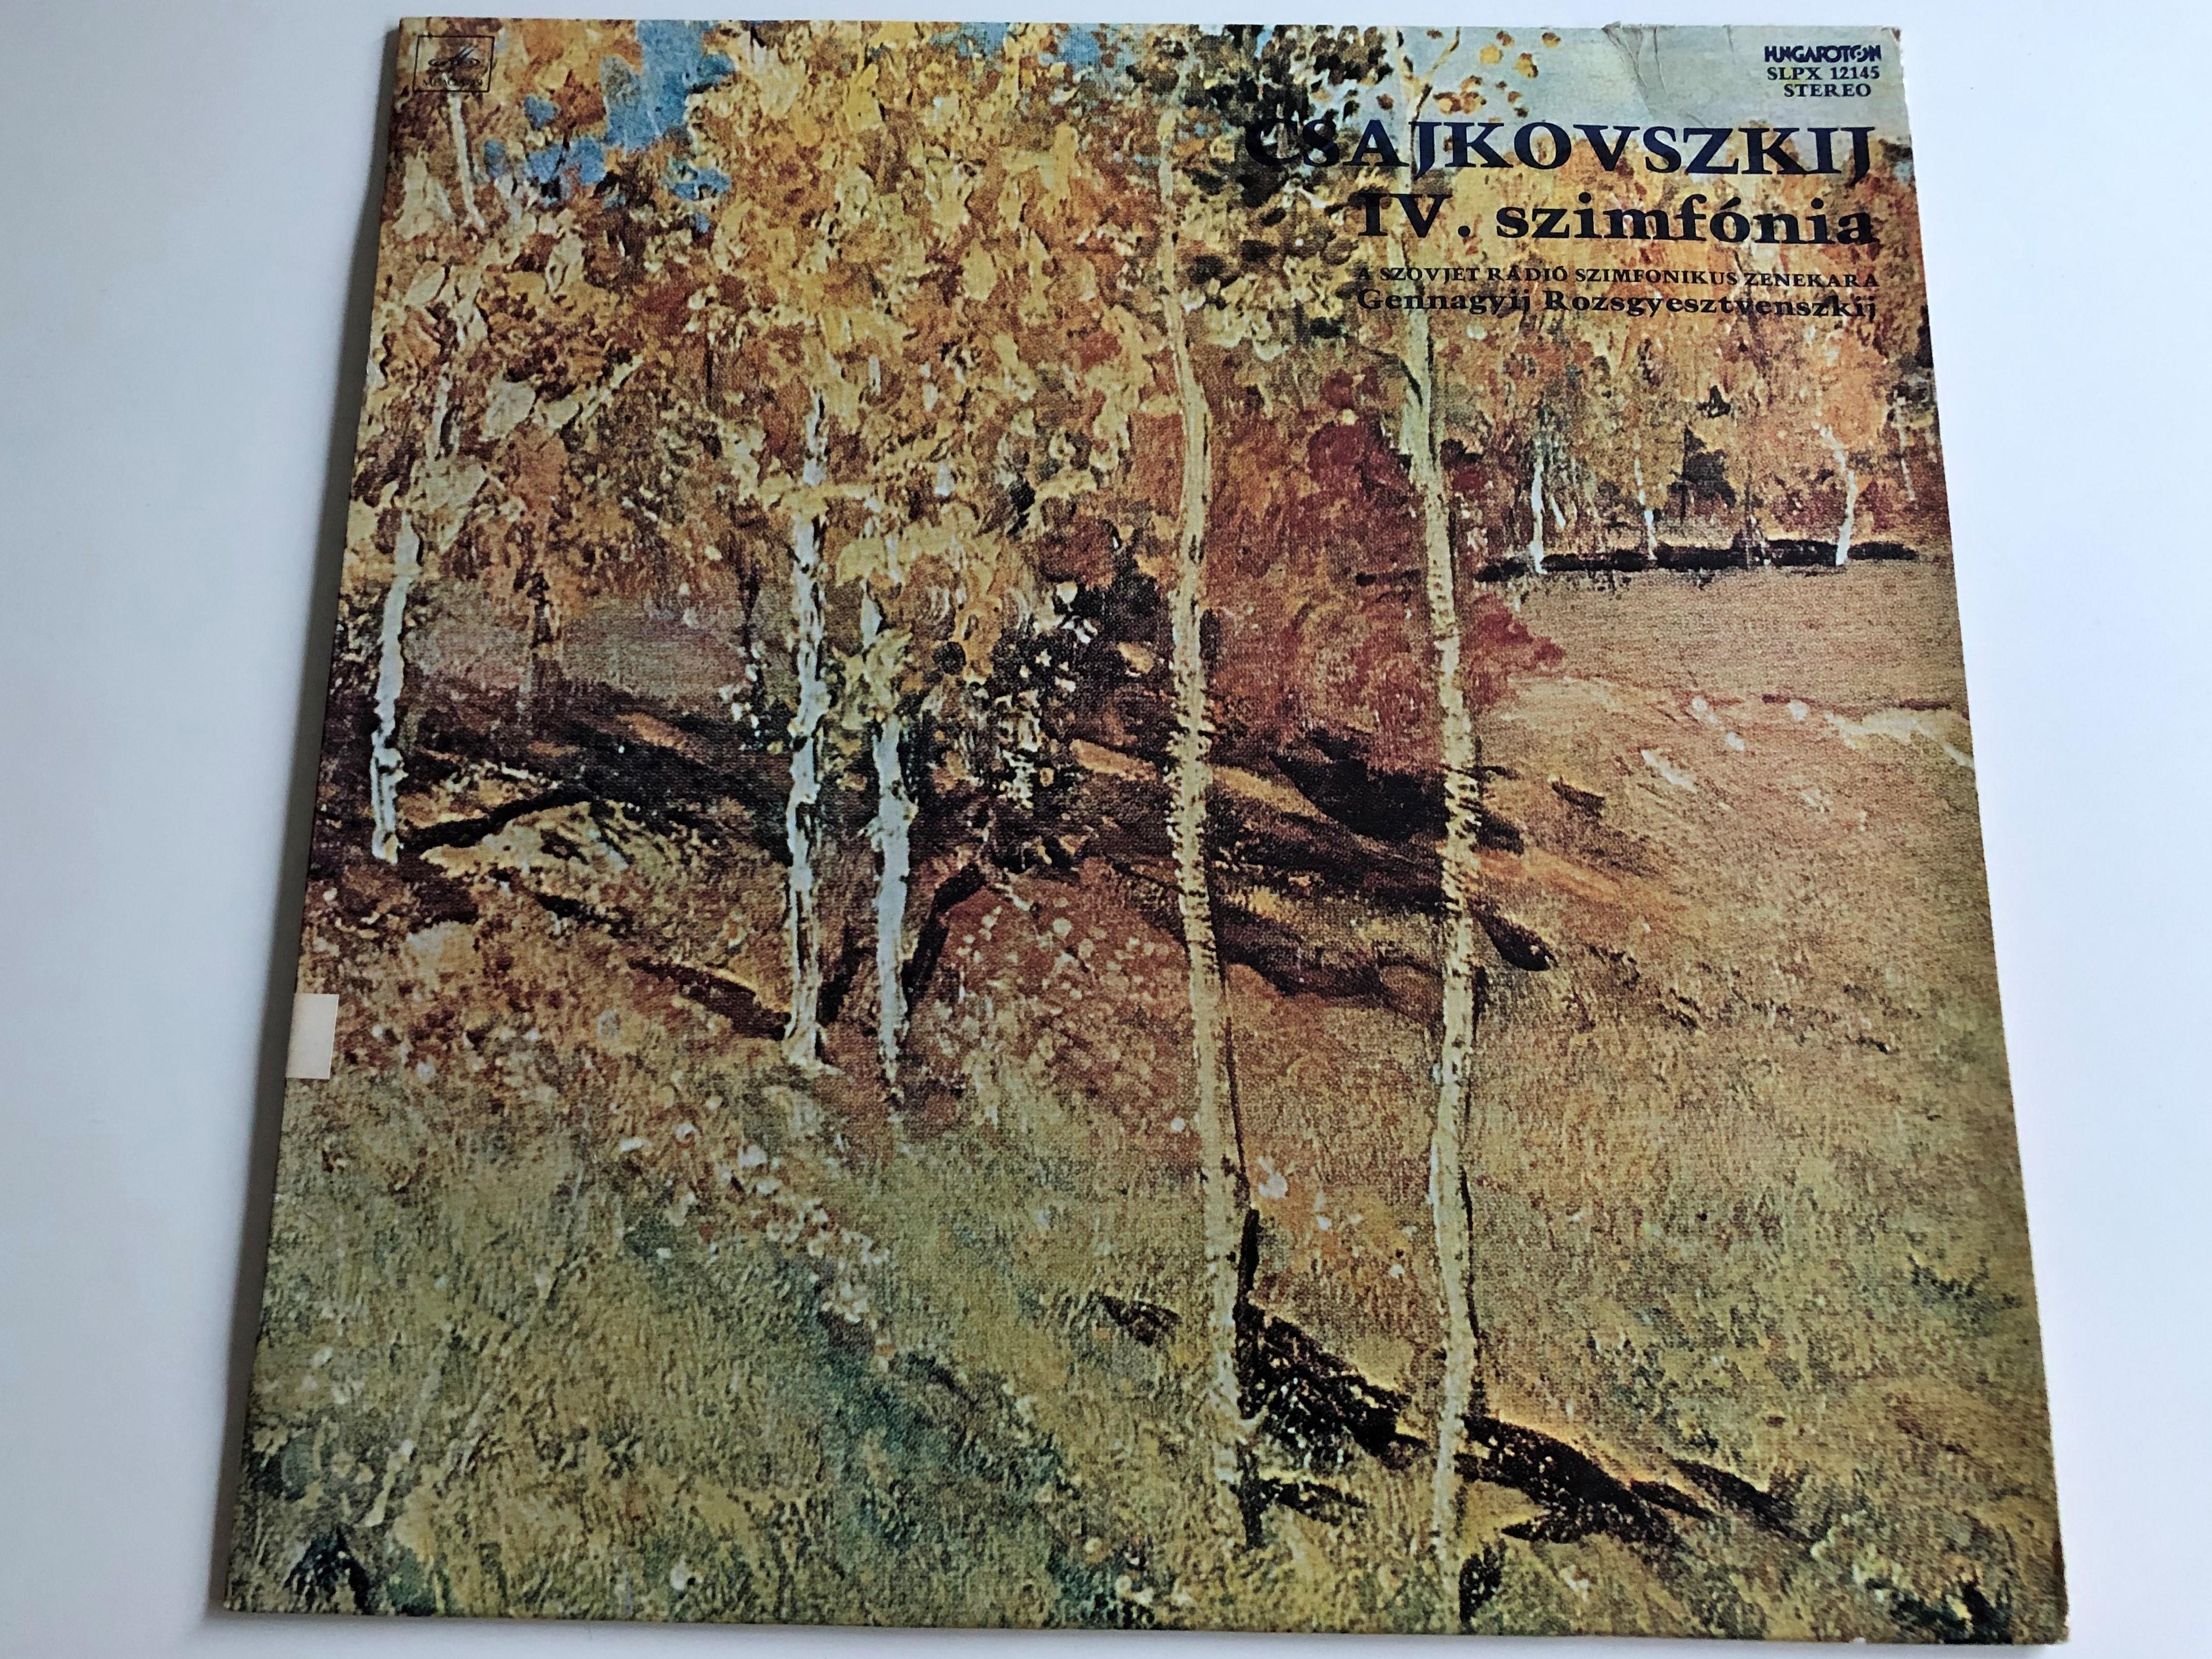 csajkovszkij-iv.-szimf-nia-op.-36-a-szovjet-r-di-szimfonikus-zenekara-gennagyij-rozsgyesztvenszkij-hungaroton-lp-stereo-slpx-12145-1-.jpg